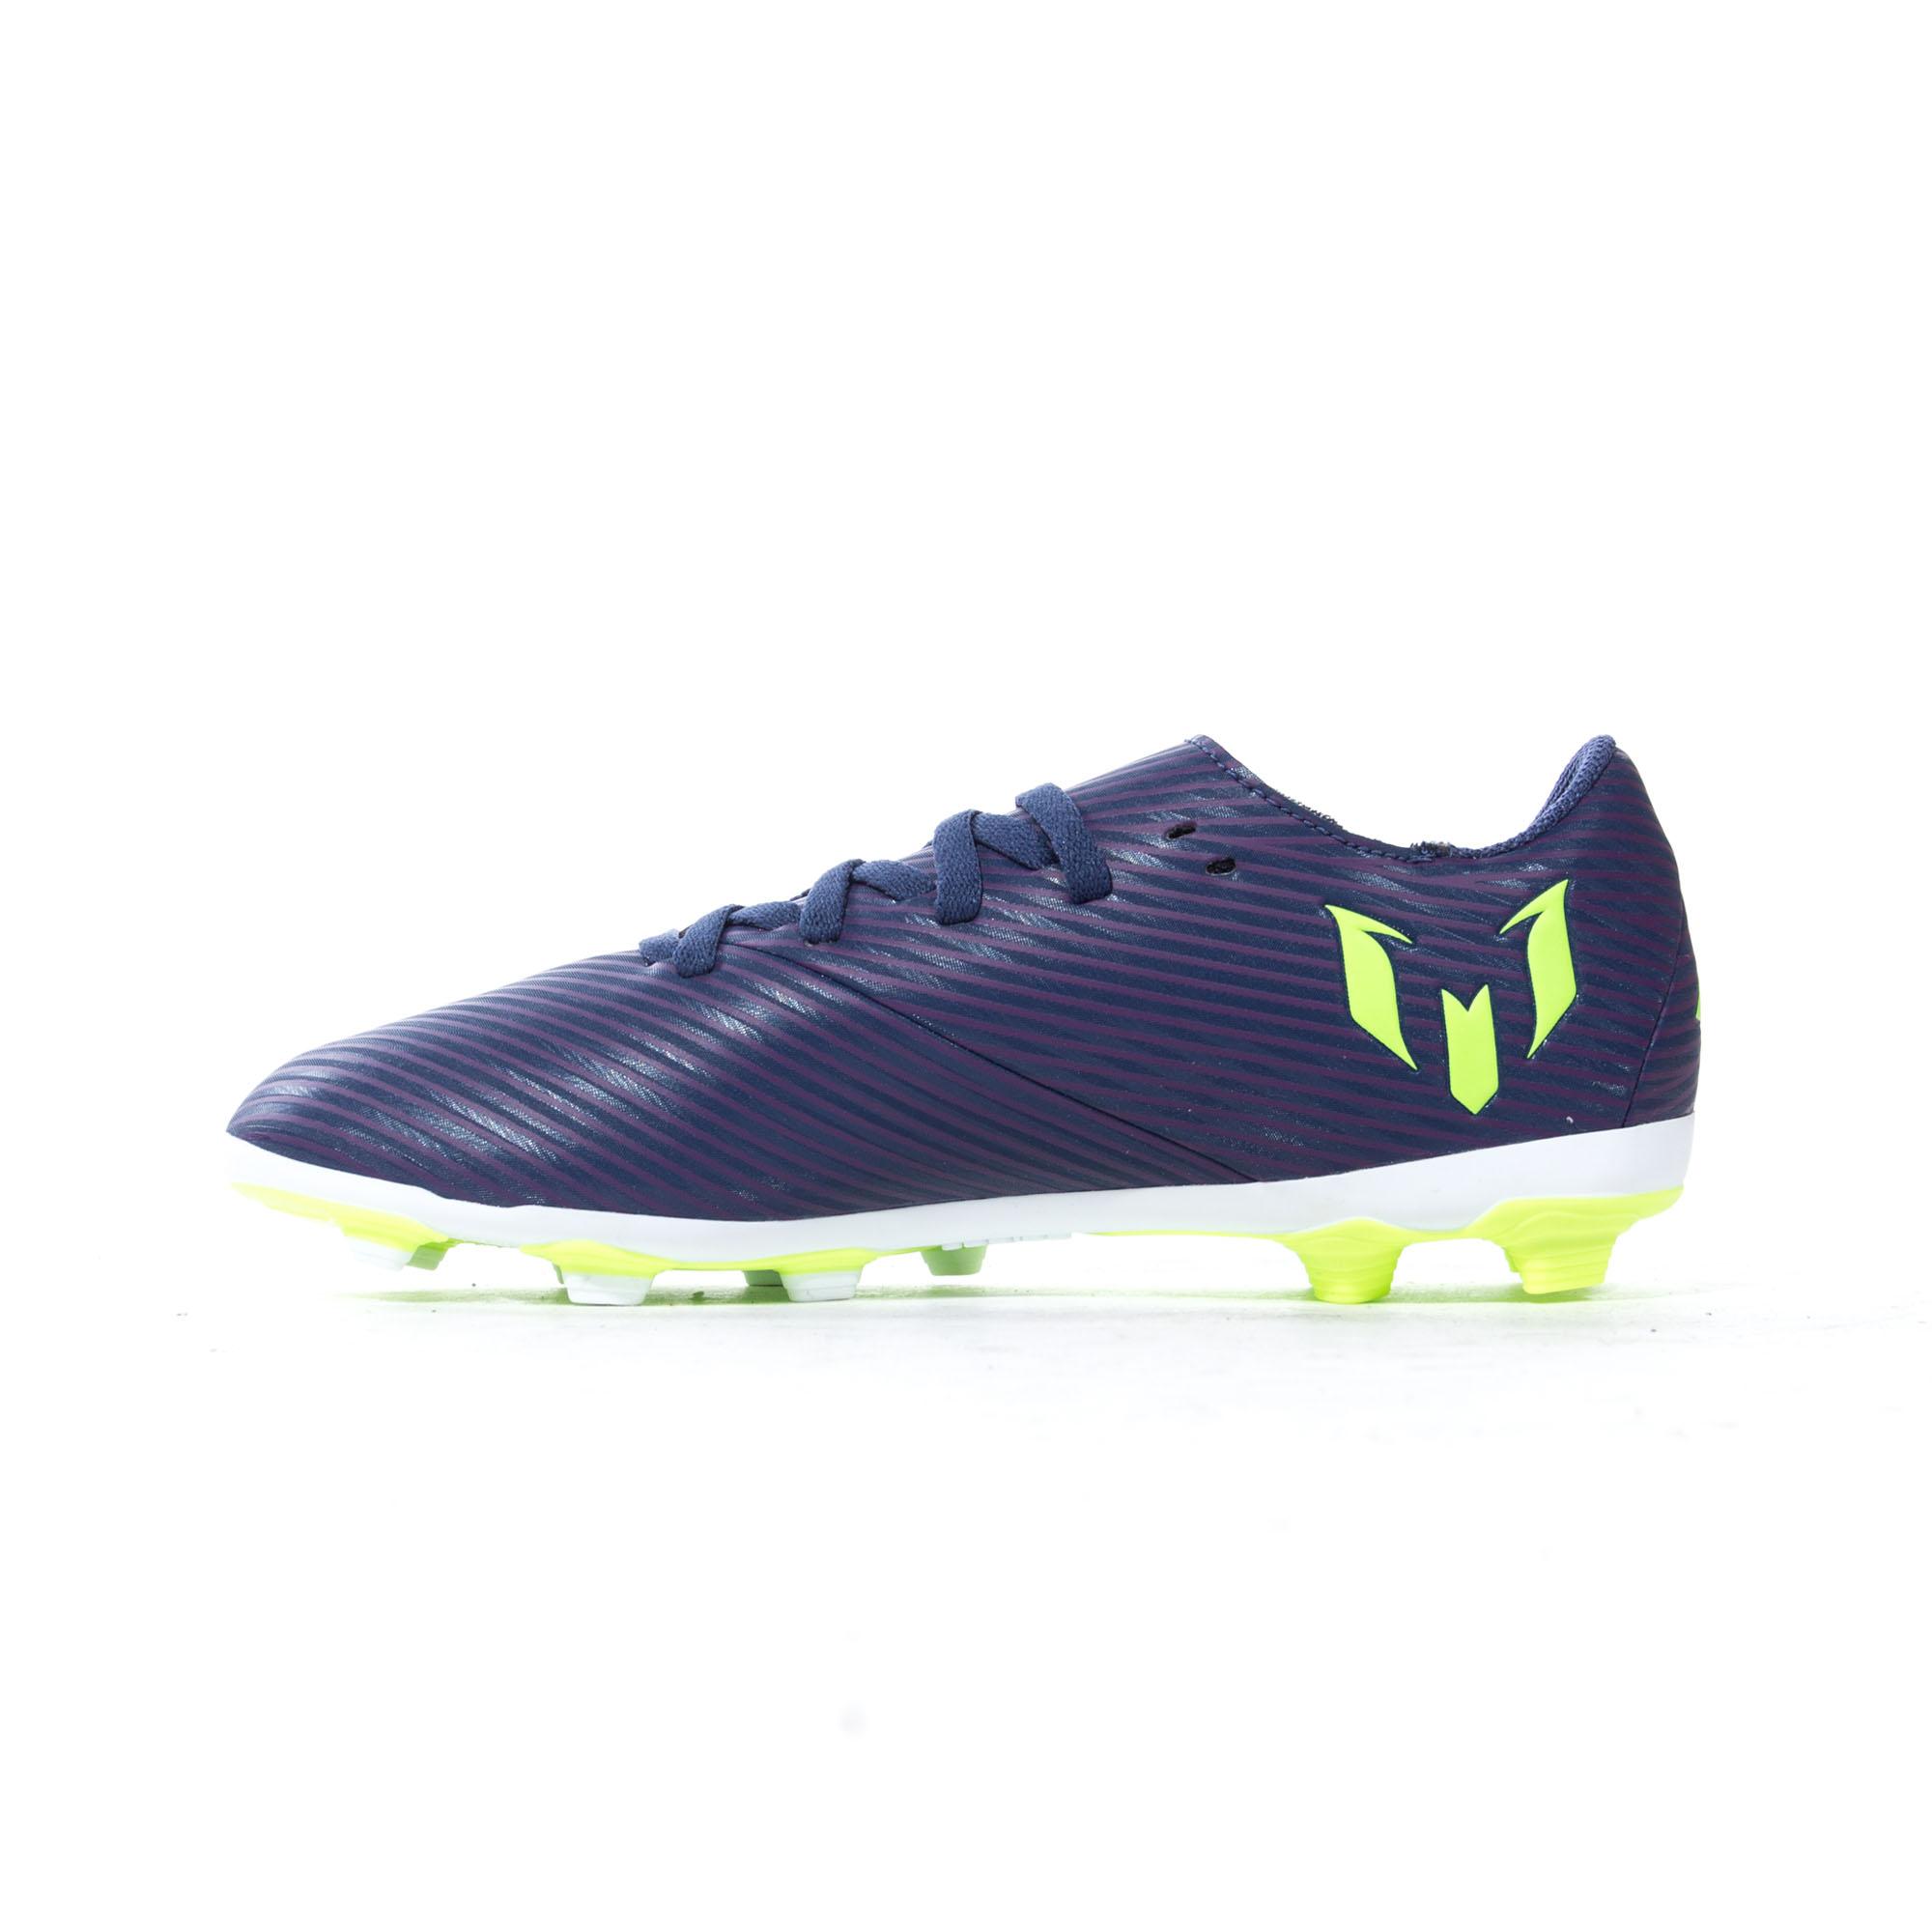 Adidas-nemeziz-Messi-19-4-FXG-Terre-Ferme-Enfants-Football-Soccer-Boot-Purple miniature 8